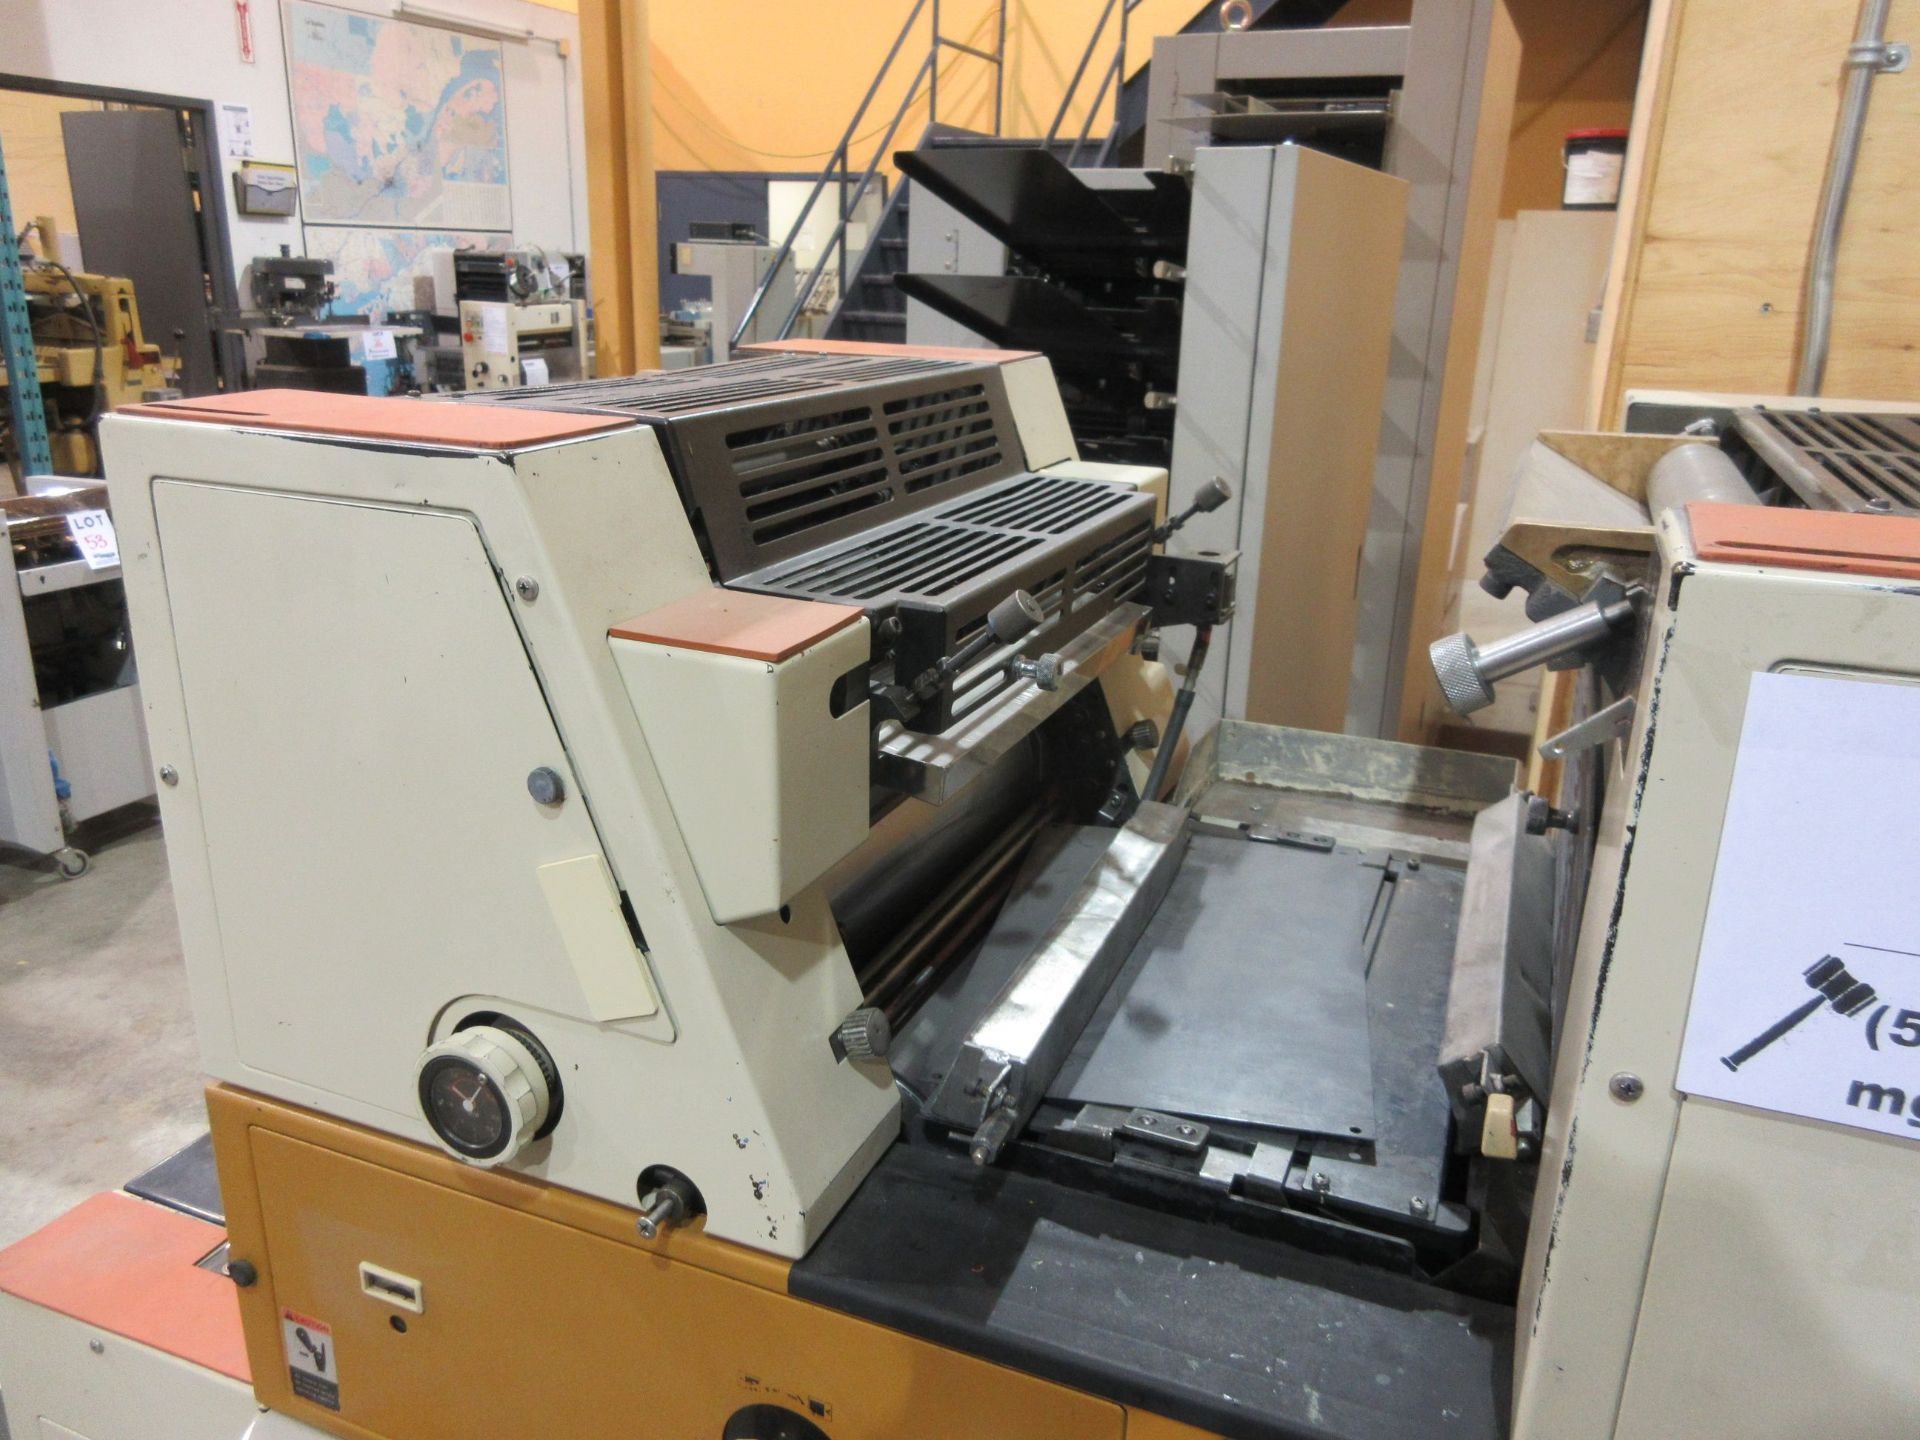 RYOBI ITEK 3985 TRUE (2) color offset press c/w ROYCE chiller - Image 4 of 8